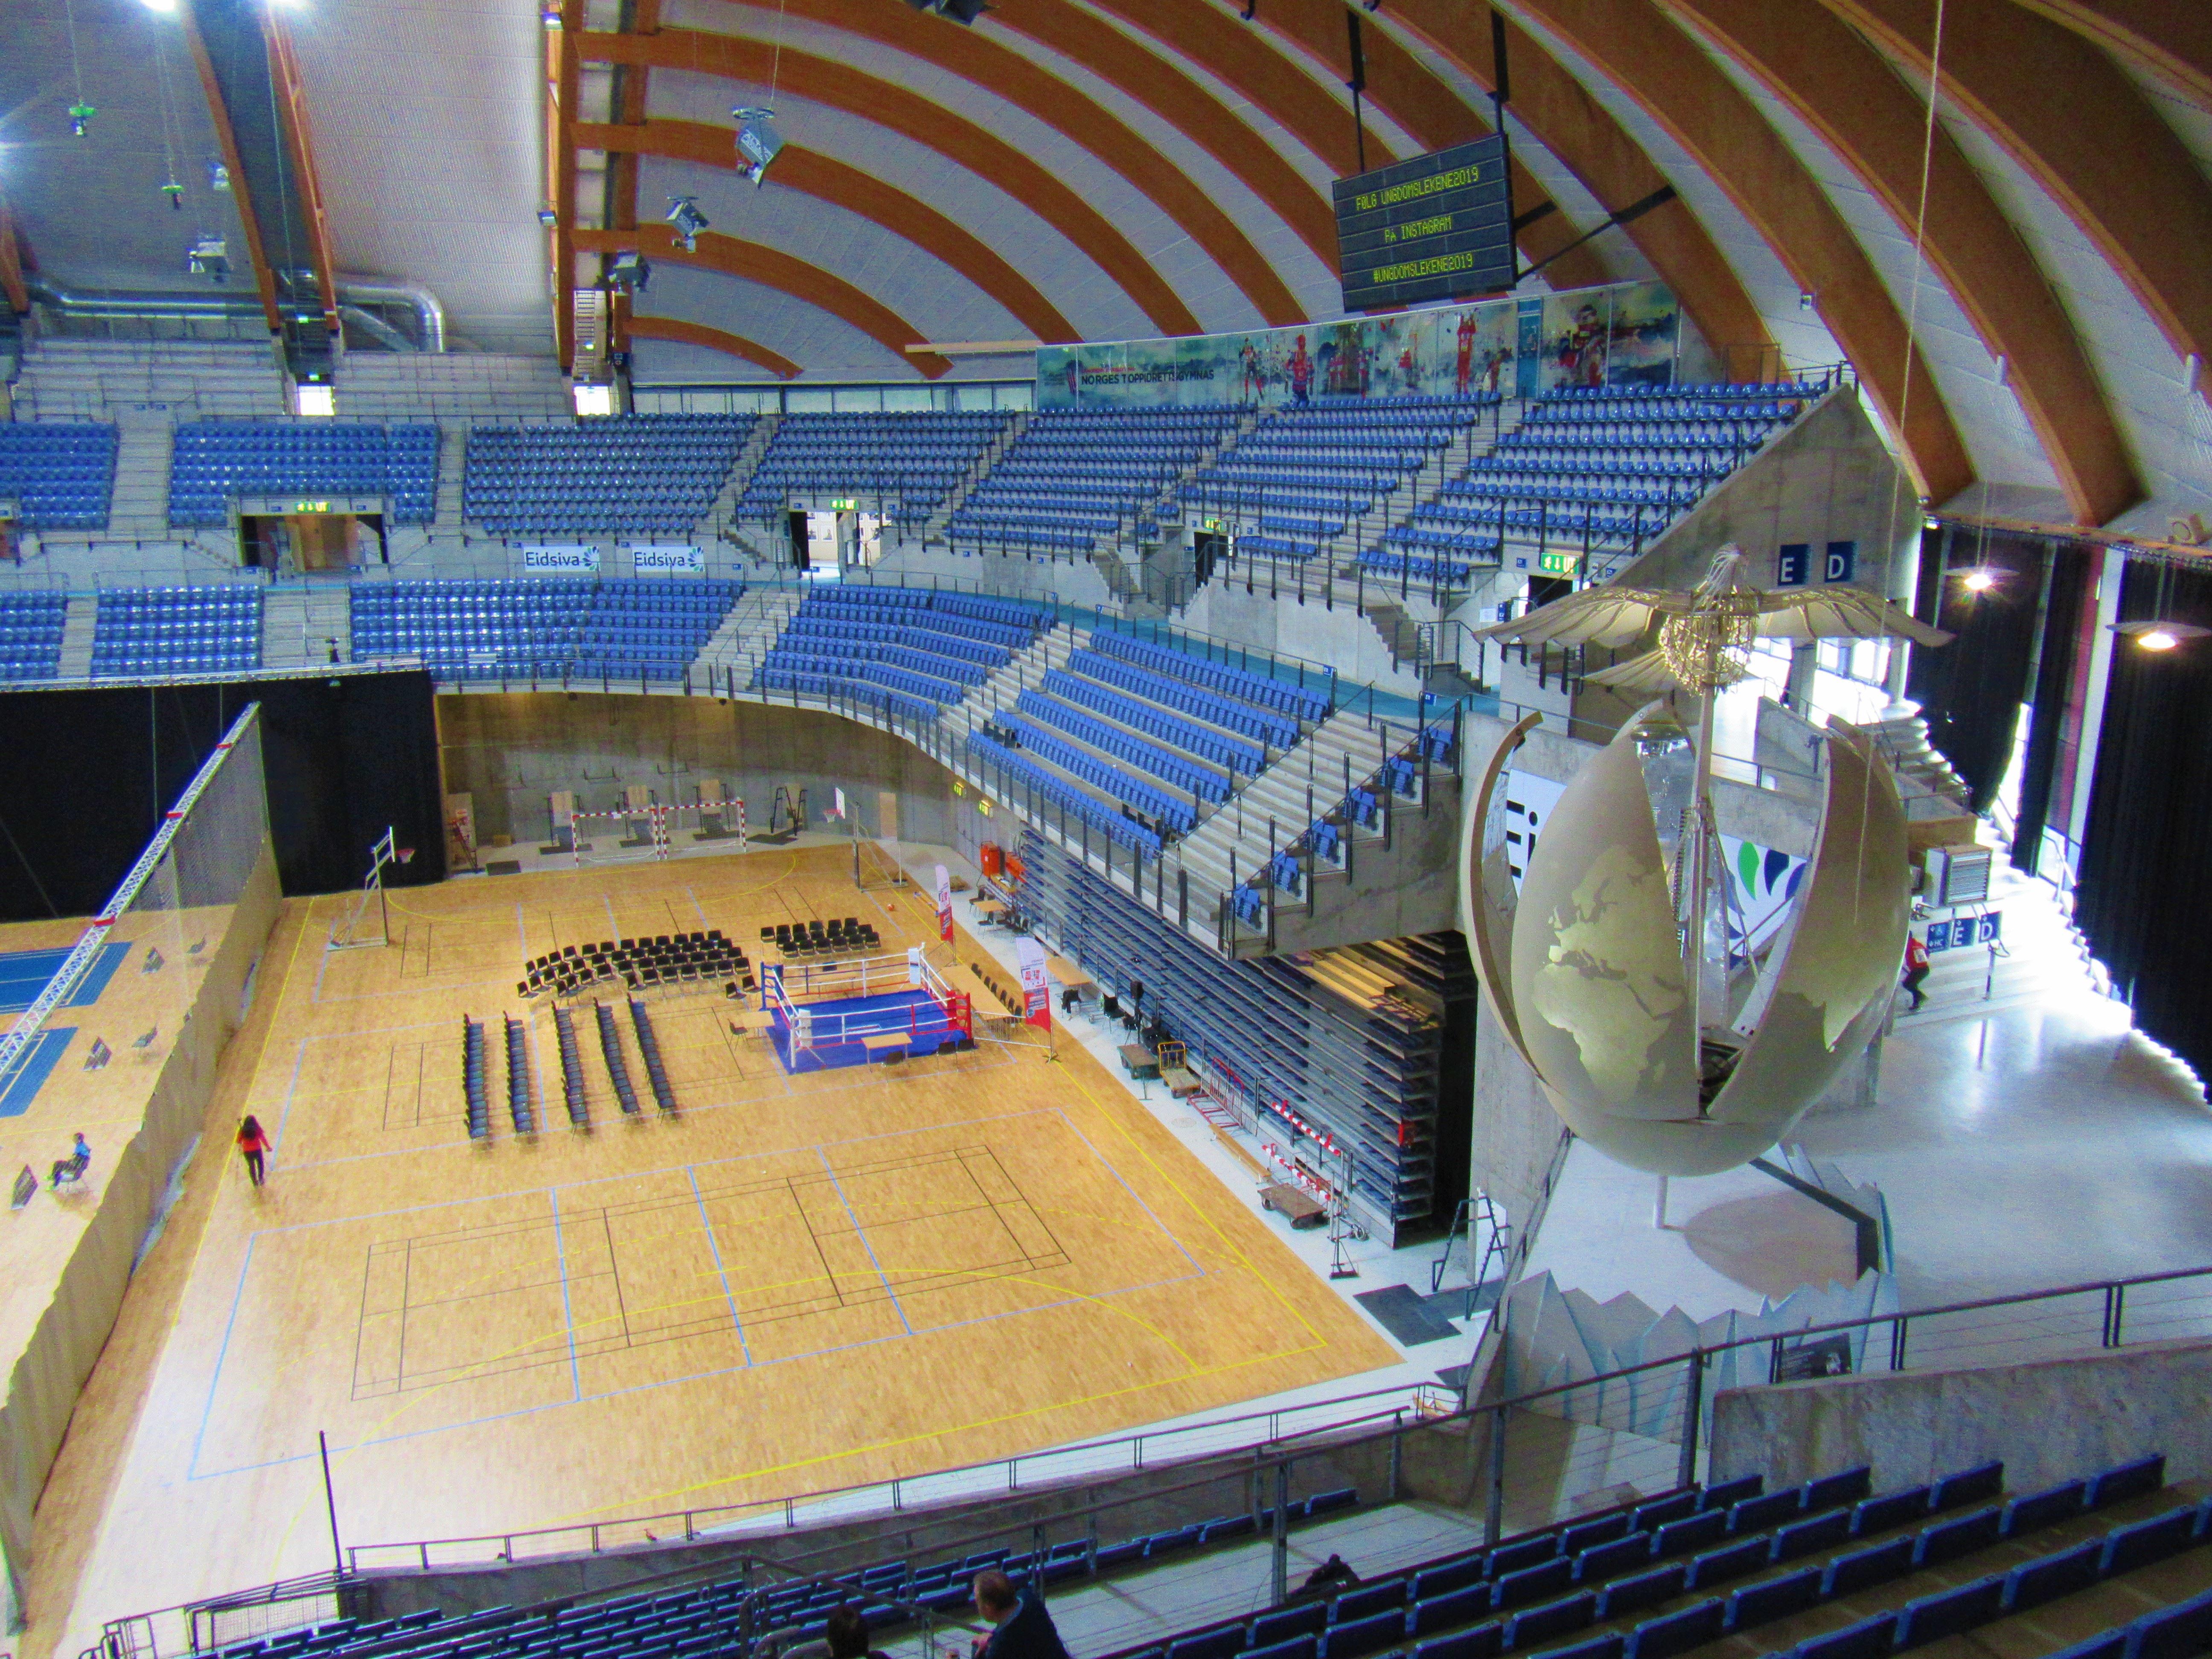 Haakons Hall in Lillehammer